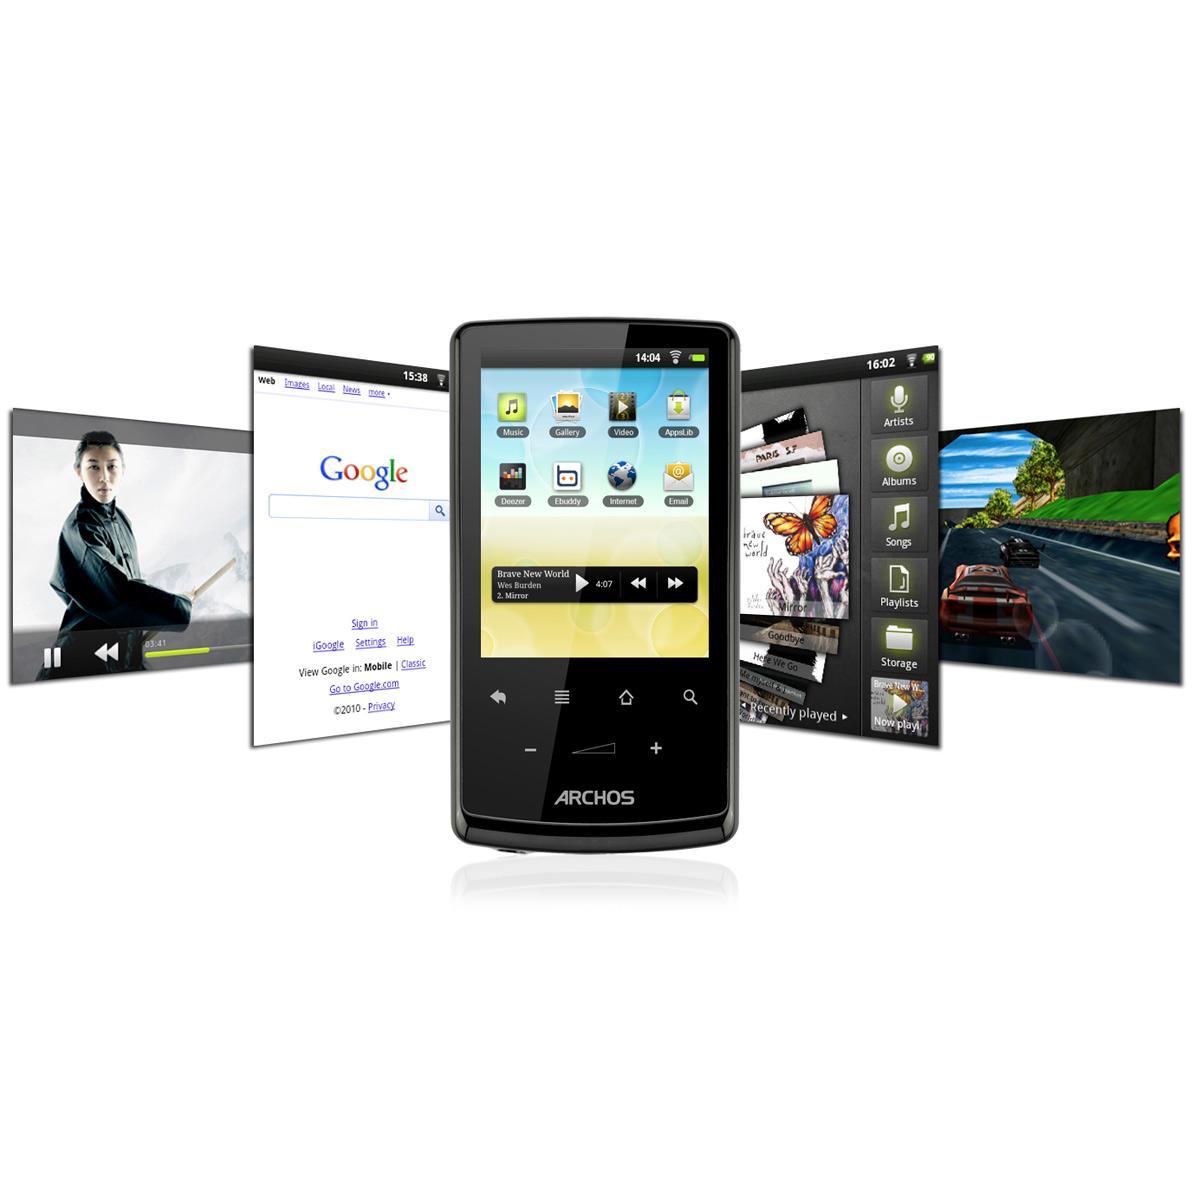 "Baladeur MP3-MP4 écran tactile 2,8"" - WIFI - Archos 28 Internet Tablet 4 Go"